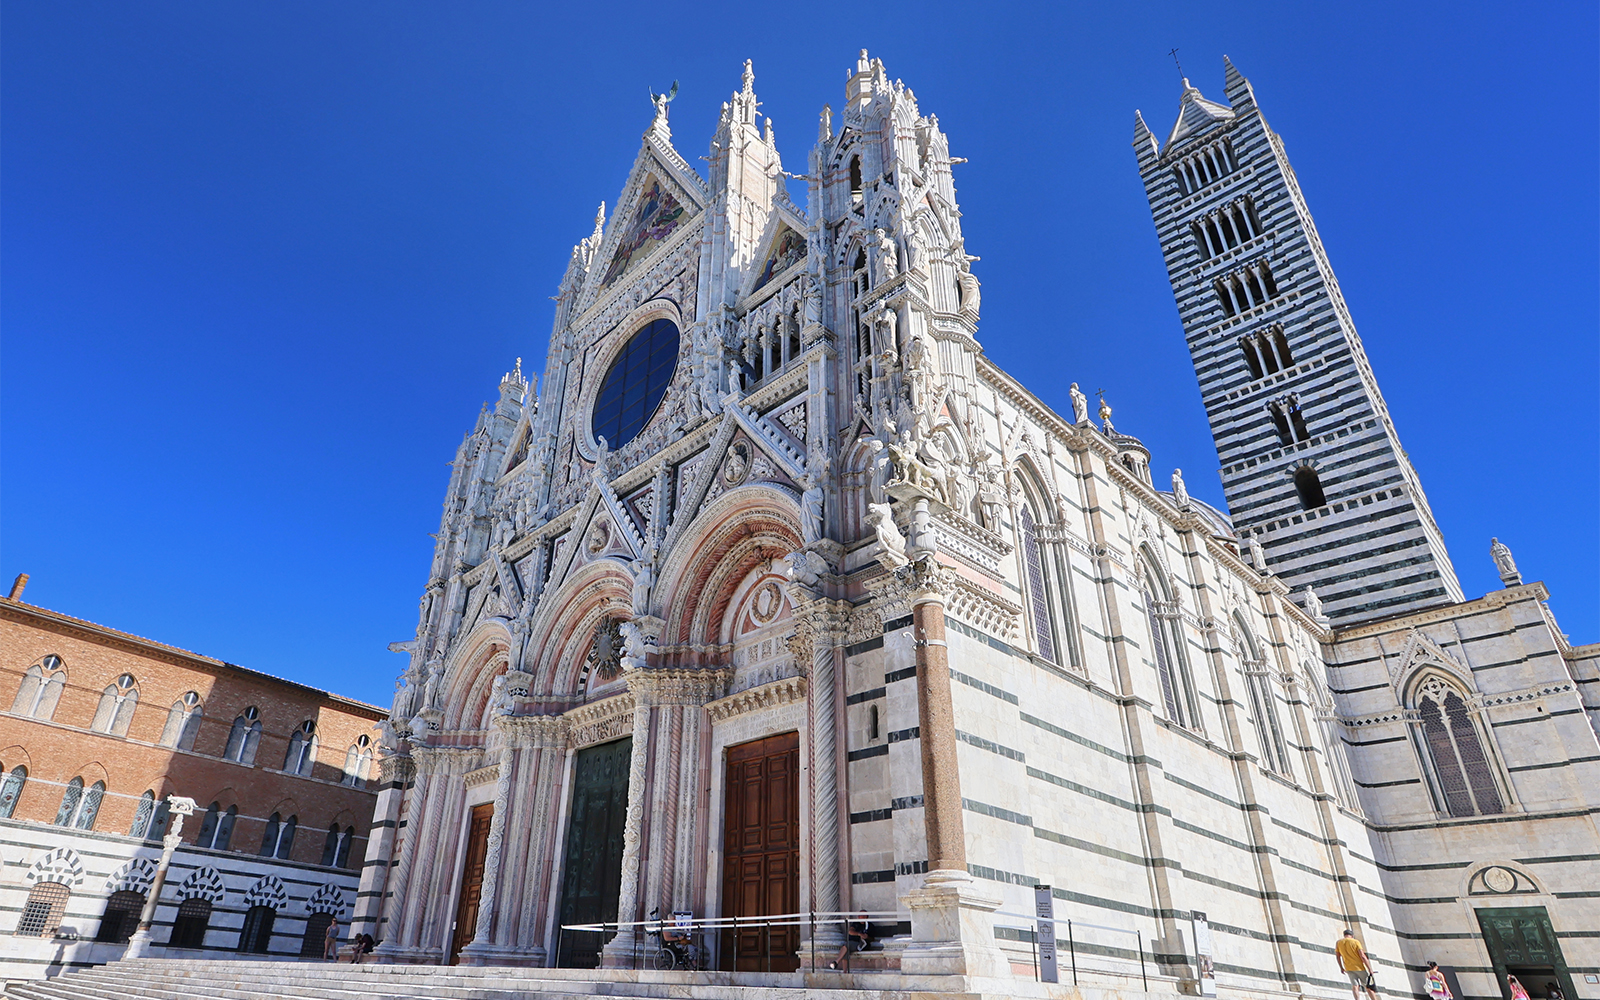 Duomo2Siena17sett2020.jpg